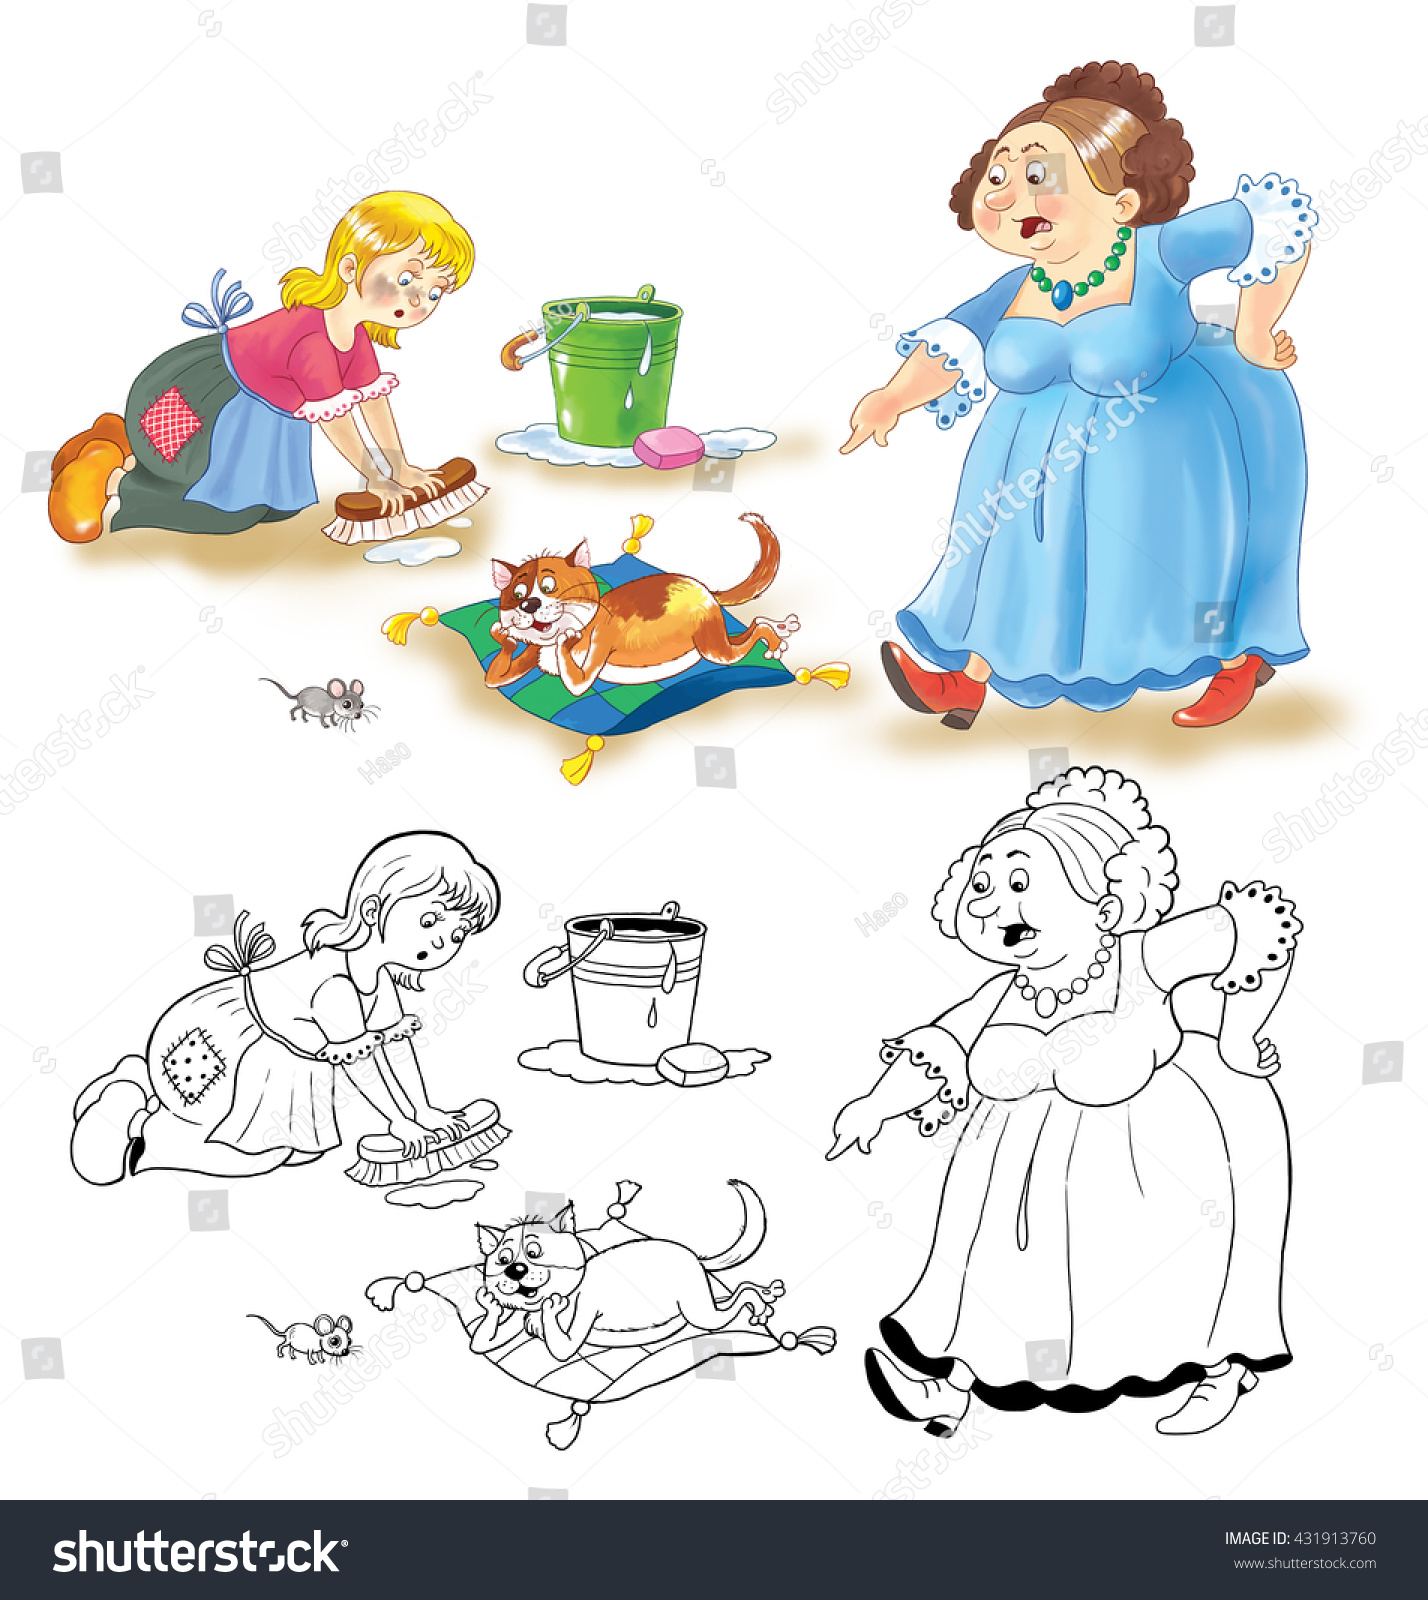 cinderella fairy tale coloring book coloring stock illustration